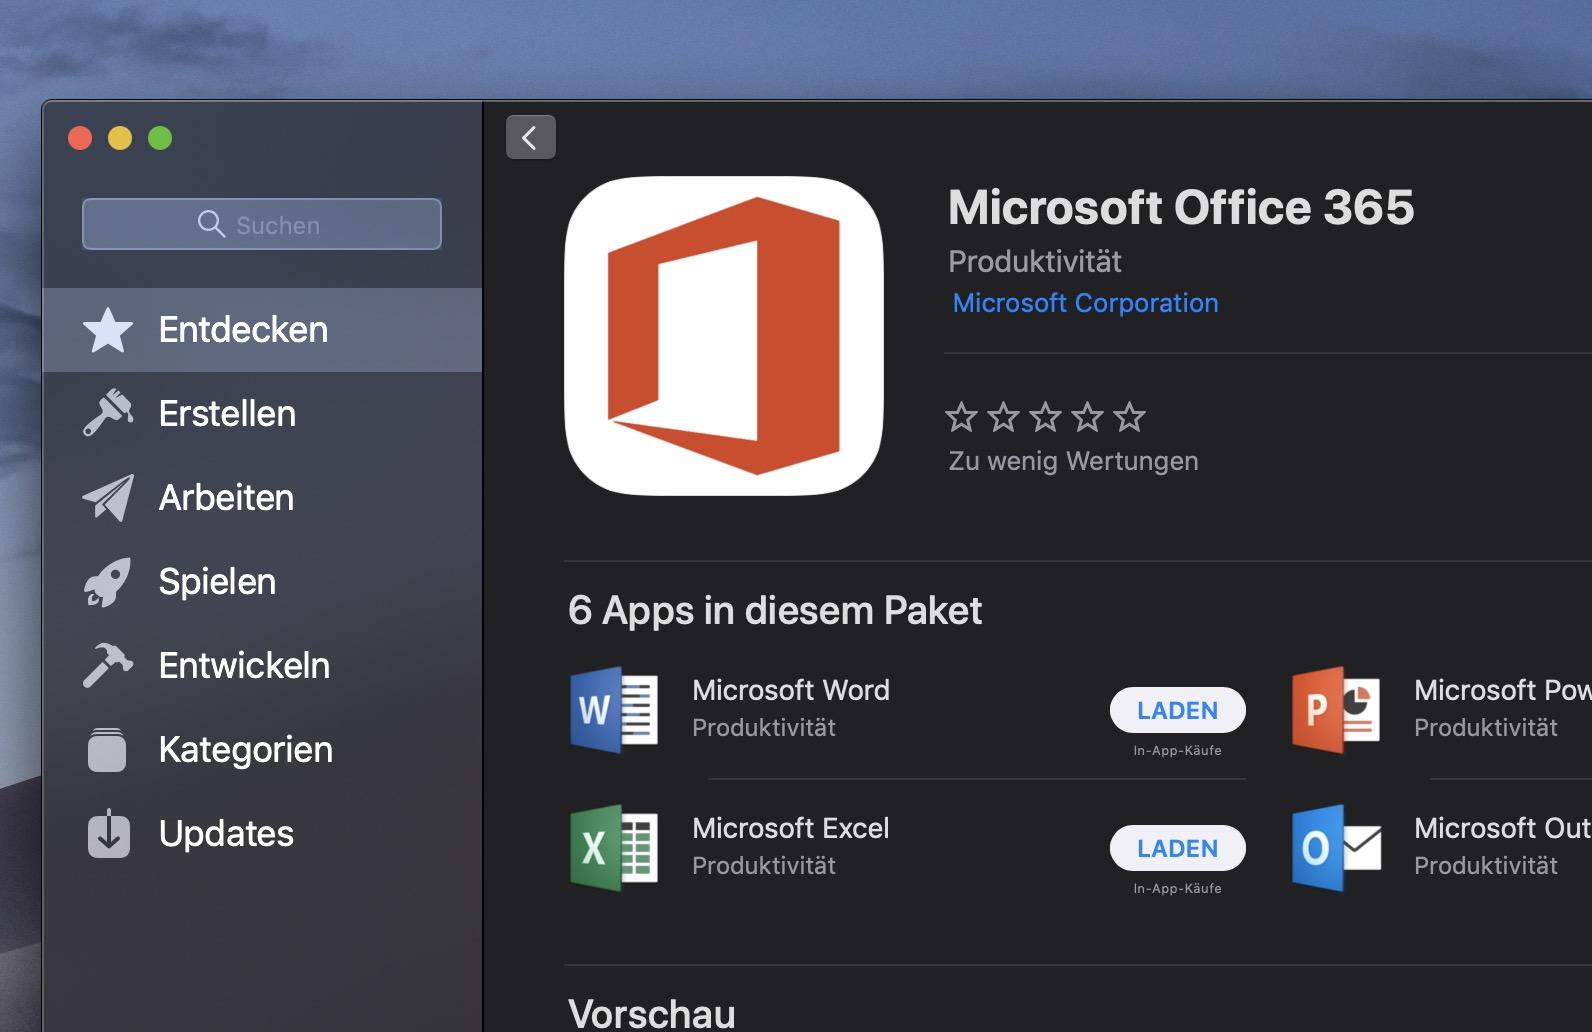 Apple Mac App Store Bietet Ab Sofort Microsoft Office 365